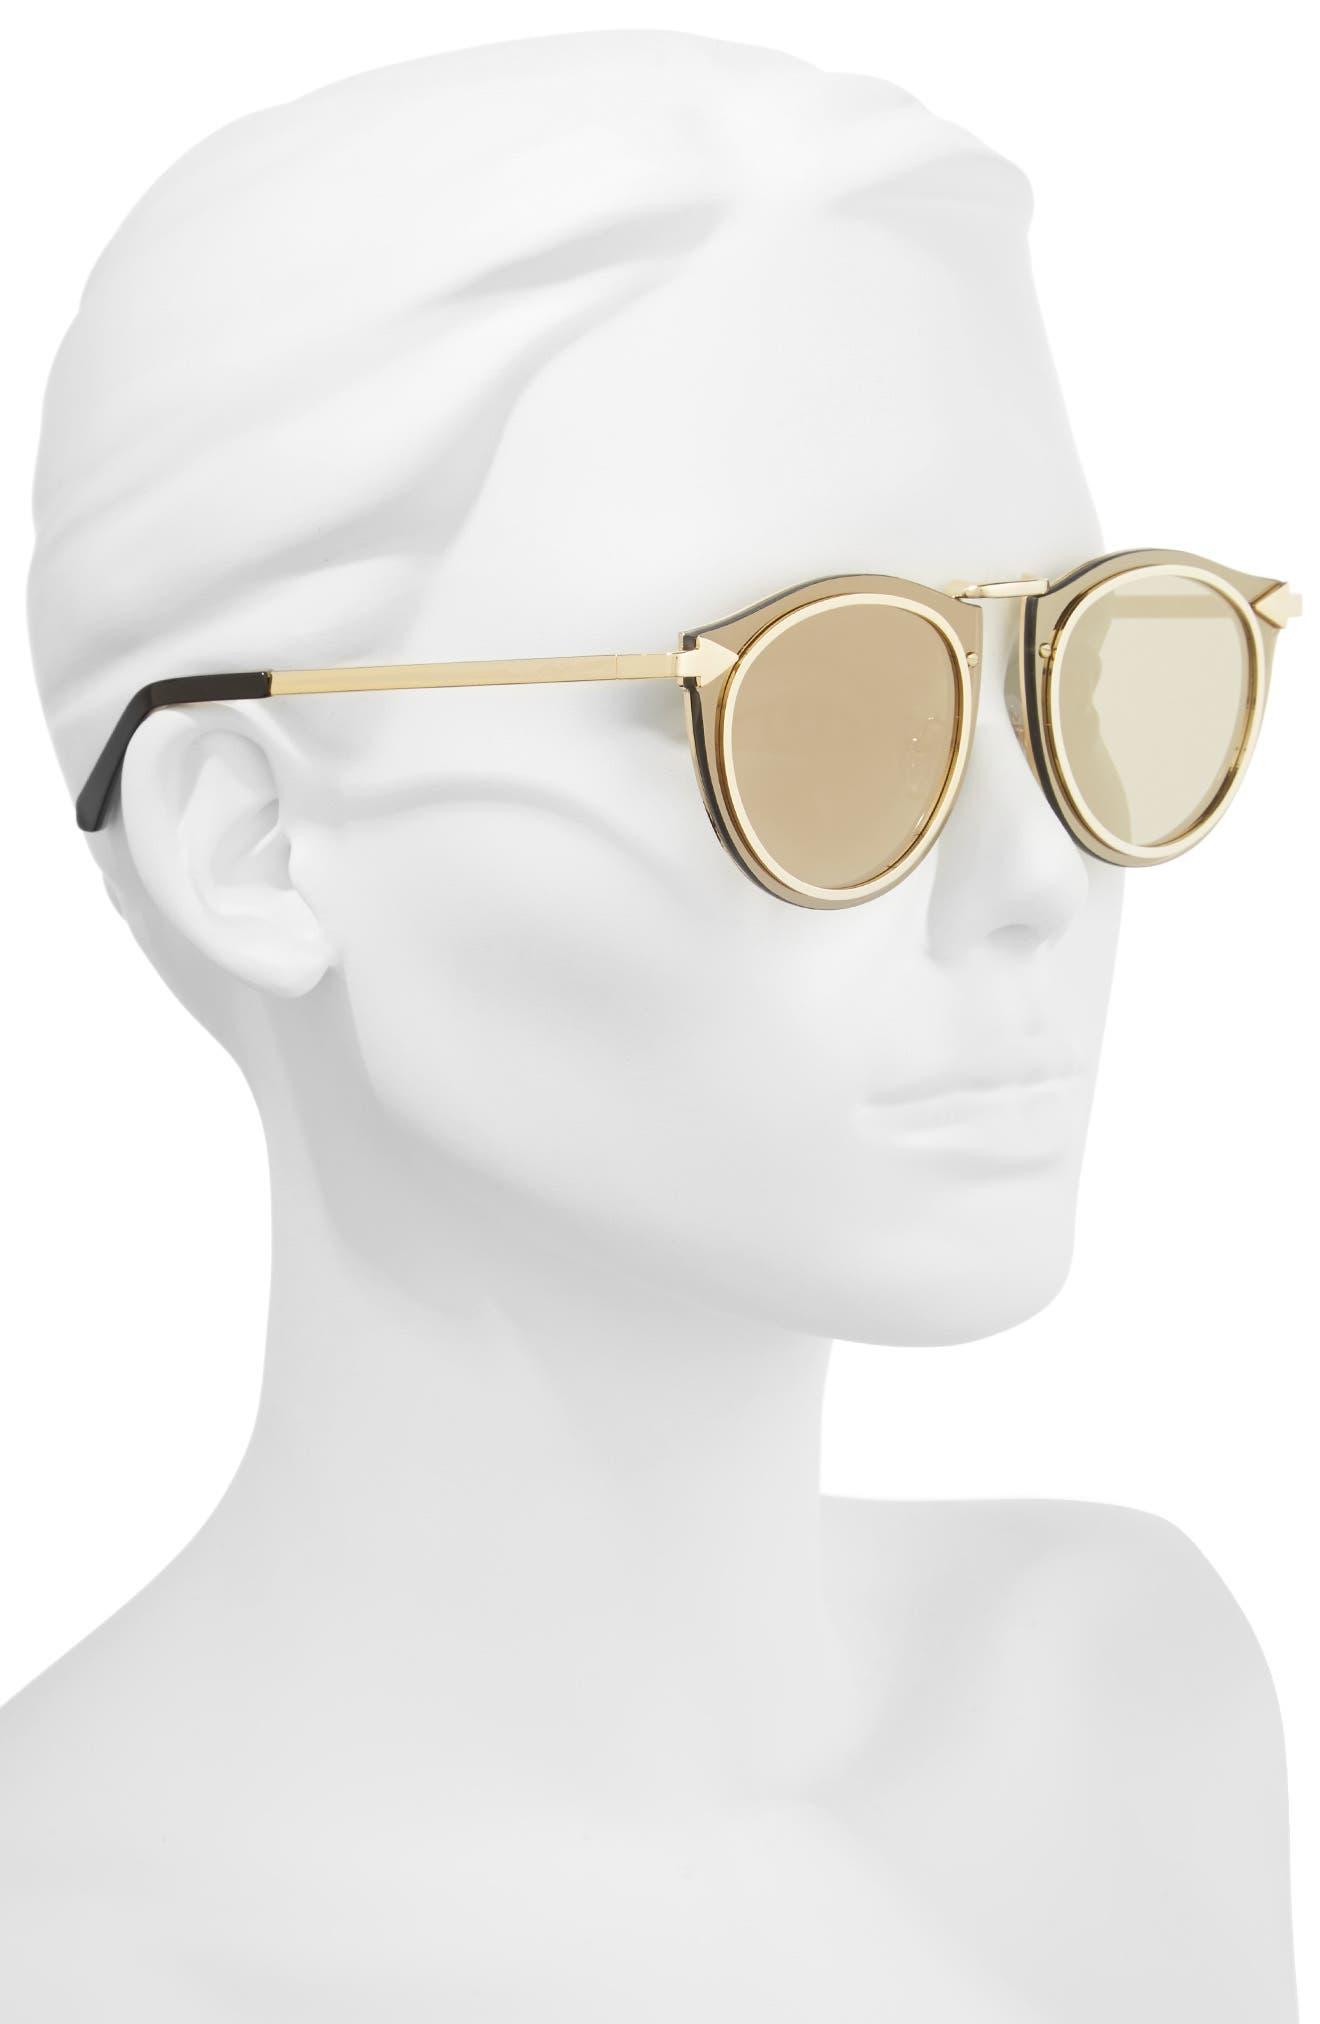 Superstars - Solar 50mm Retro Sunglasses,                             Alternate thumbnail 2, color,                             Gold